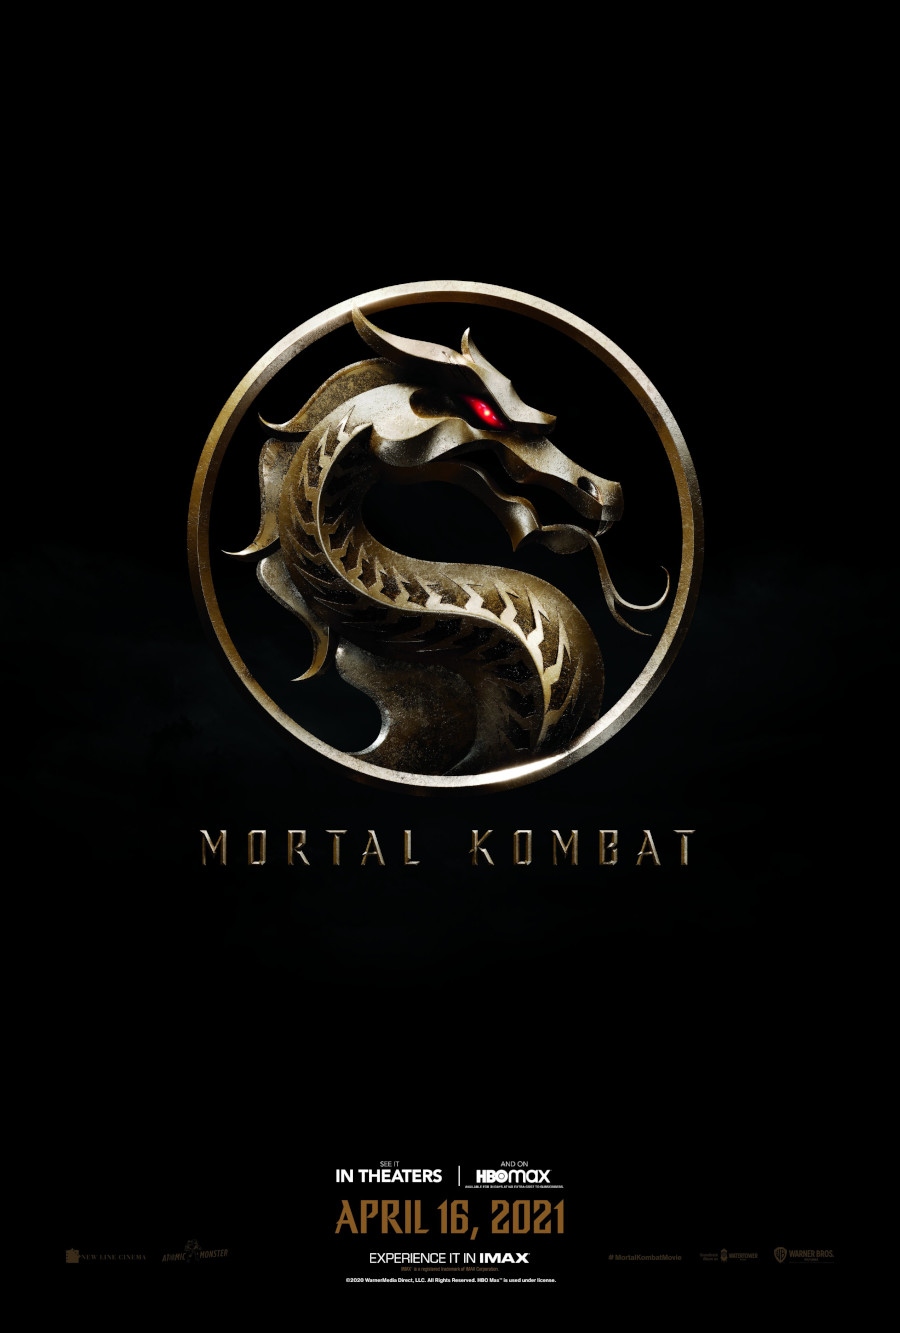 Mortal Kombat 2021 First Look Reveals Sub-Zero, More ...